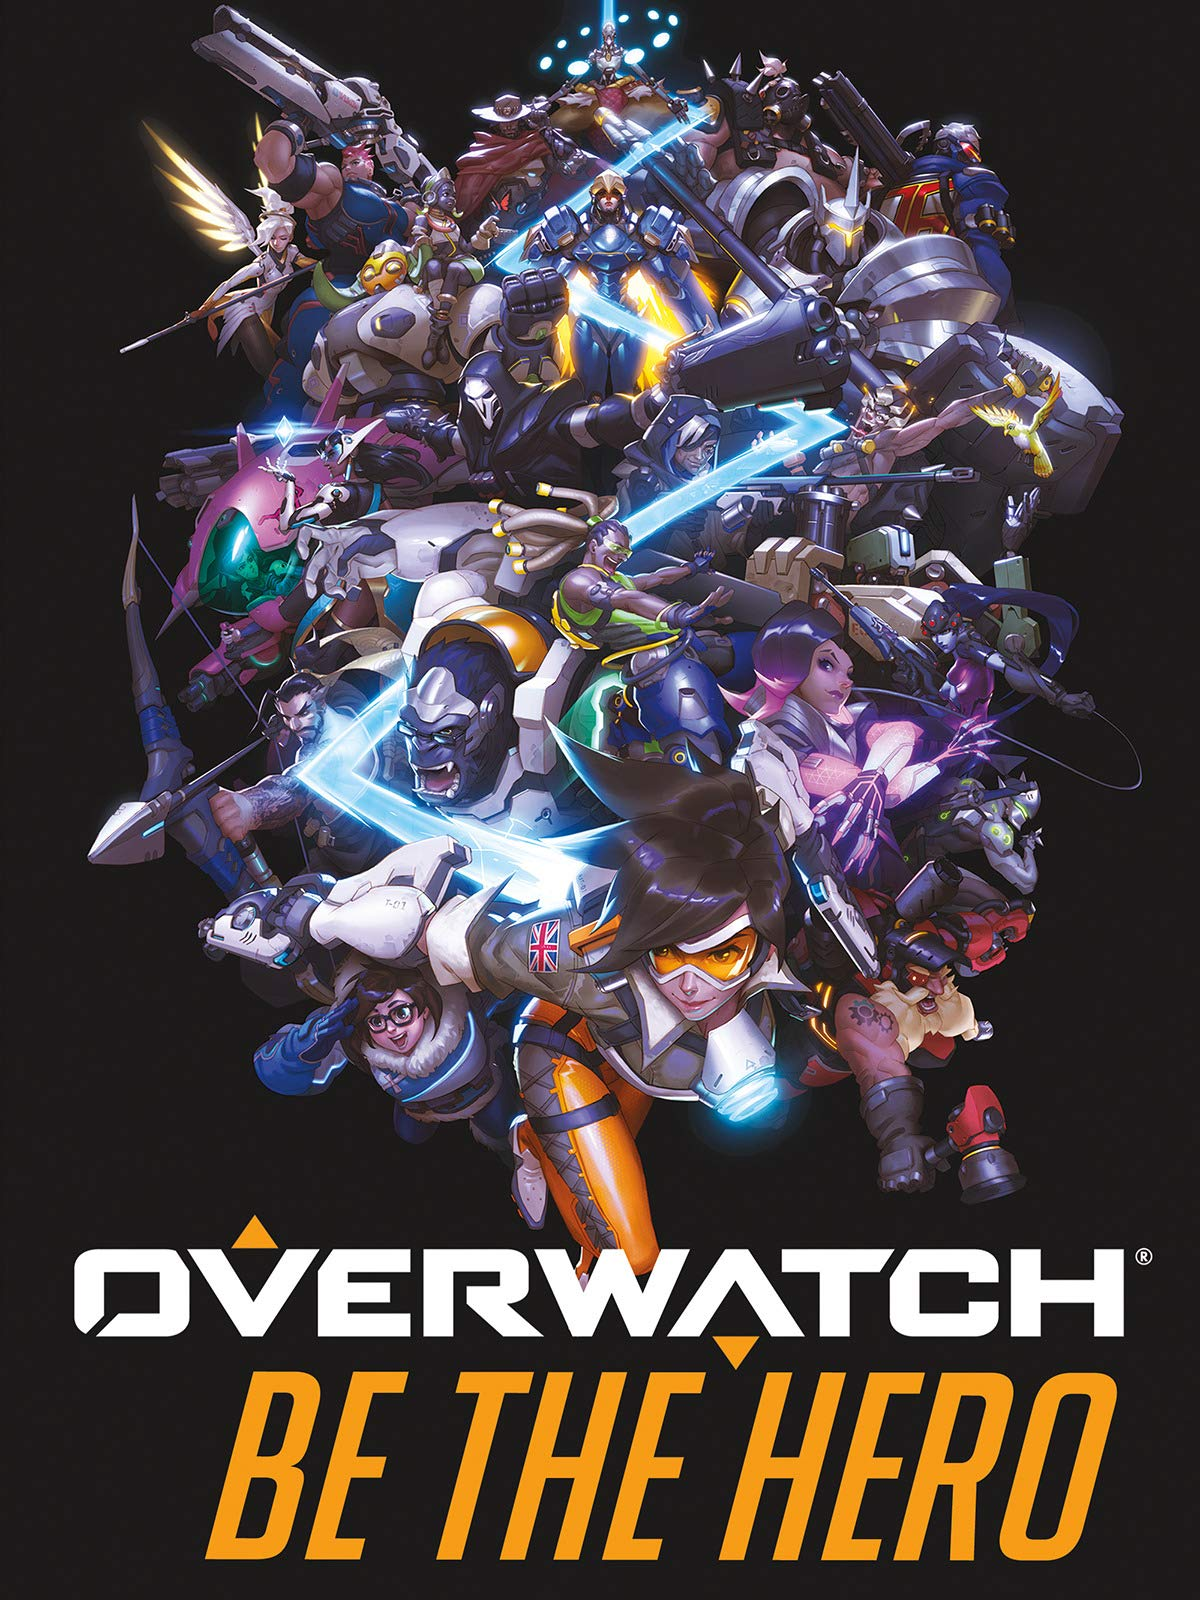 Overwatch: Be the Hero